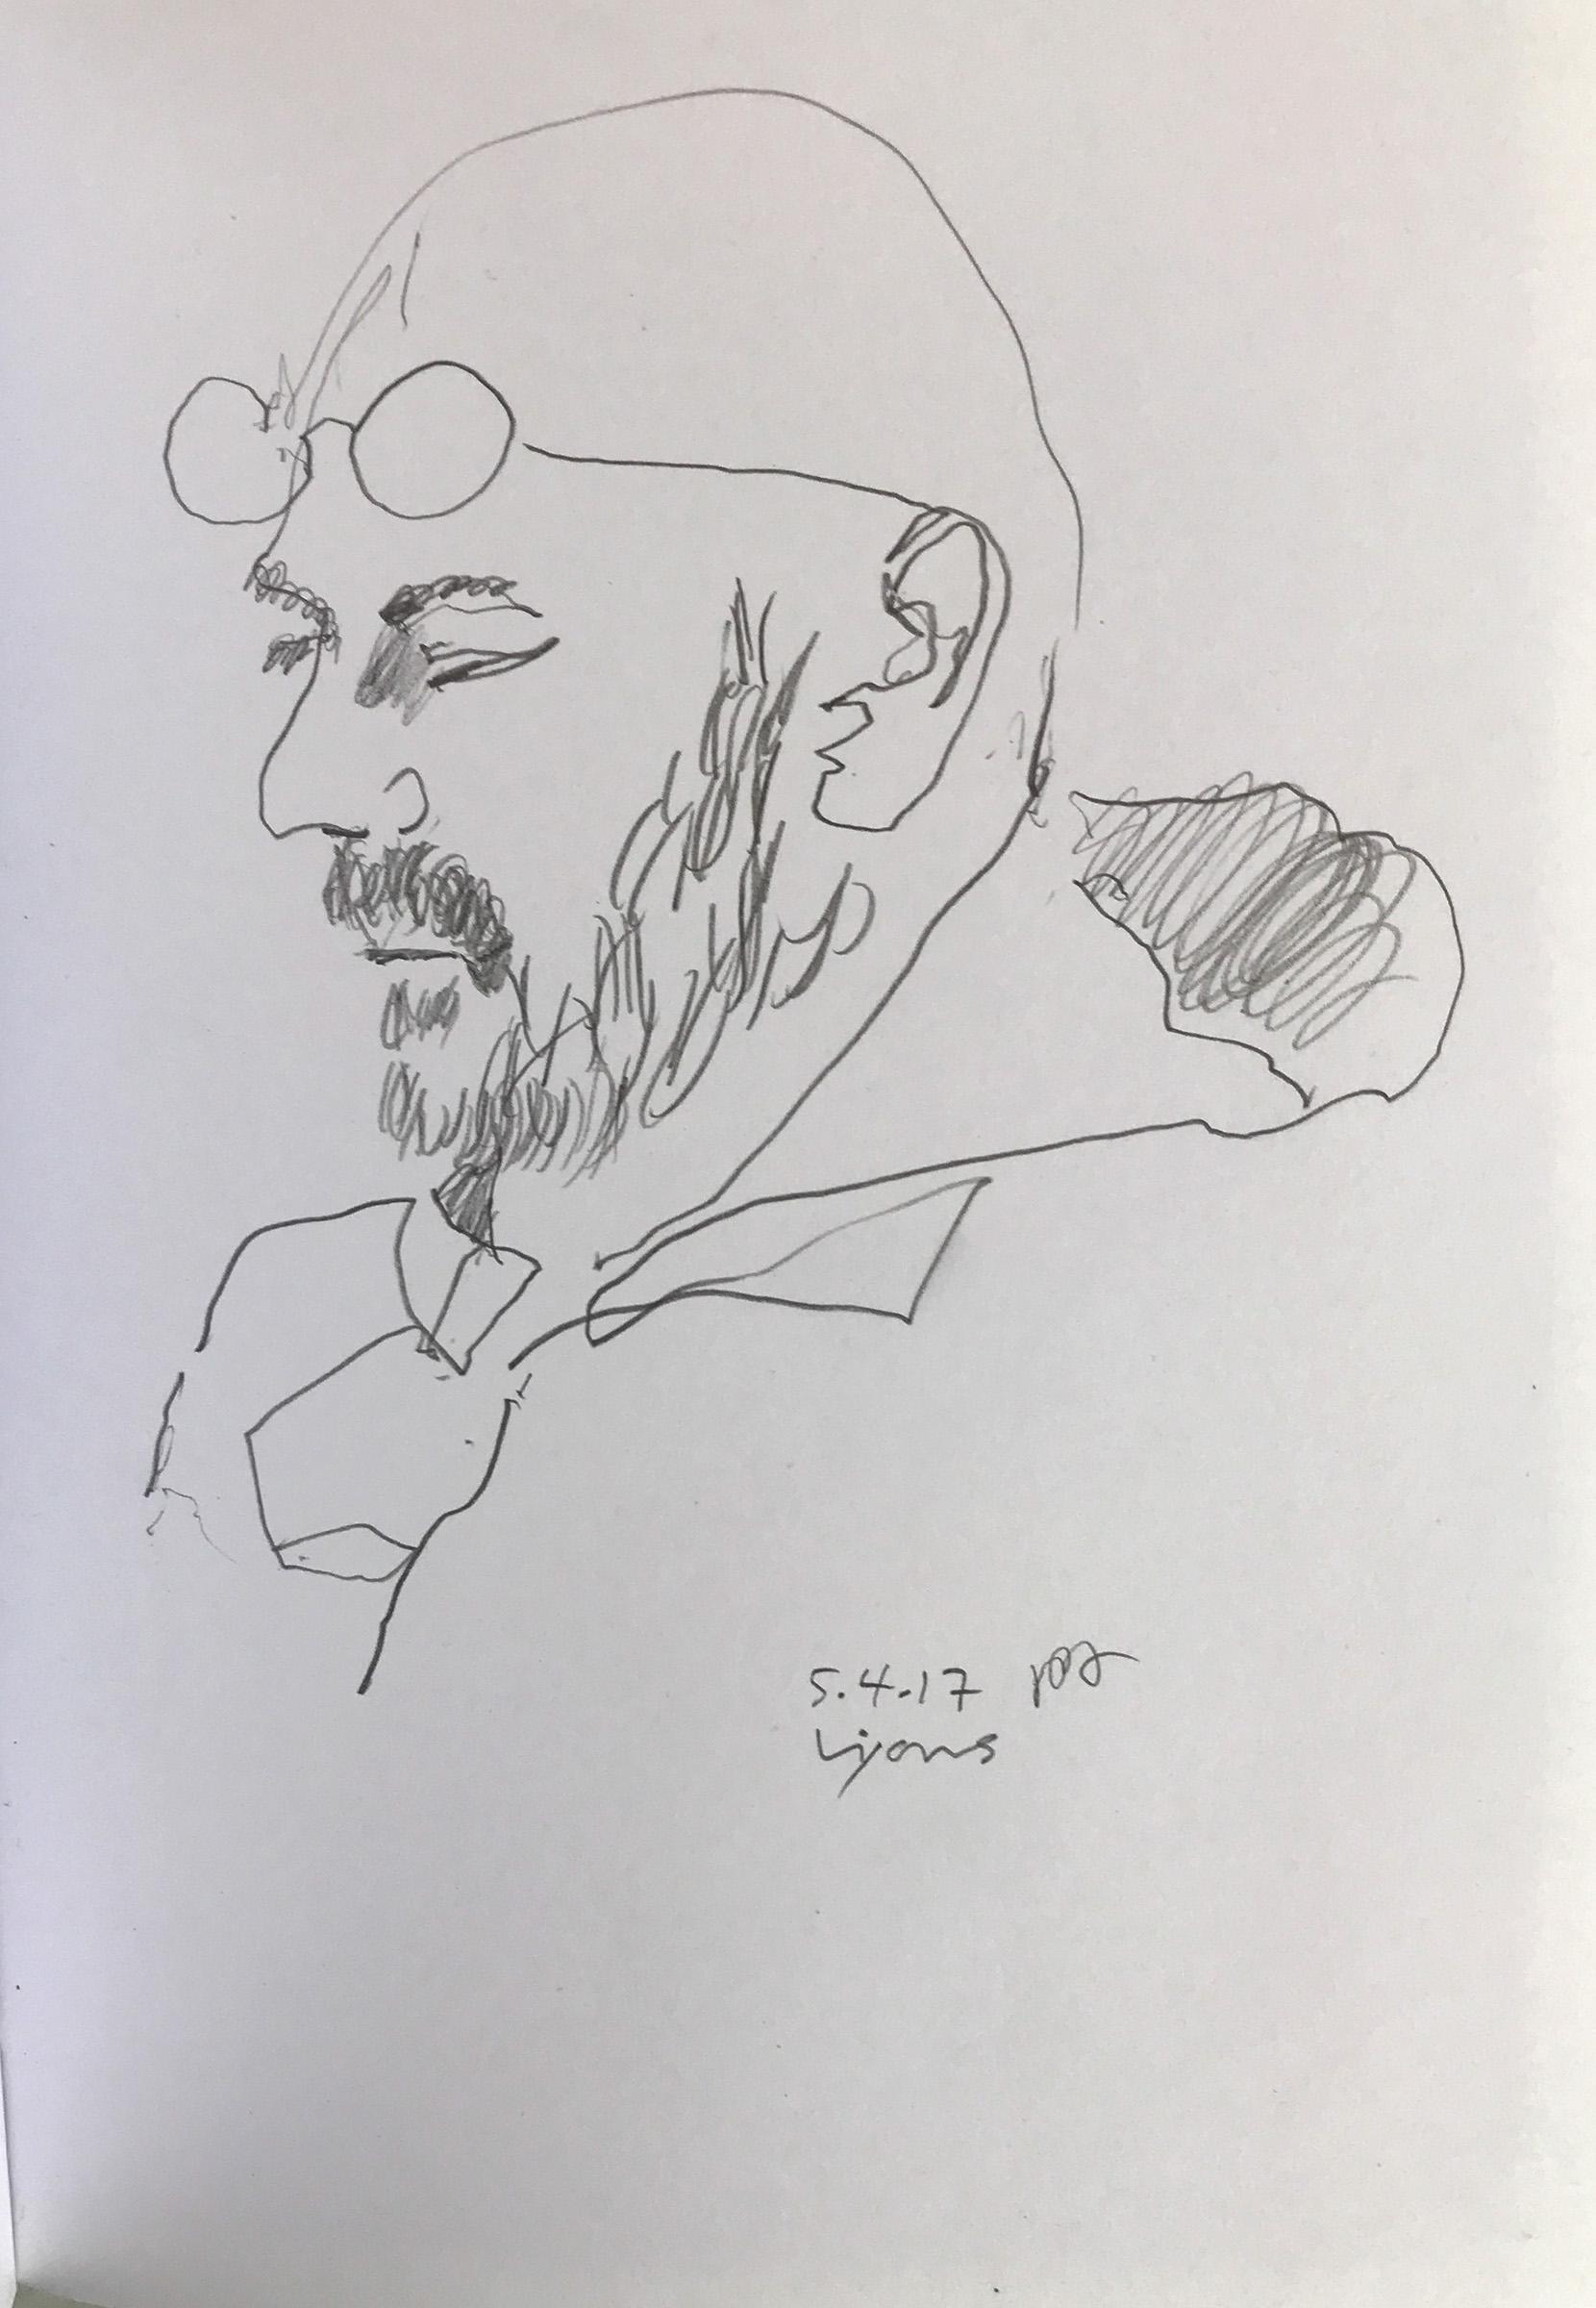 SITE-15-4-17 Lyons Eye Center drawing.jpg